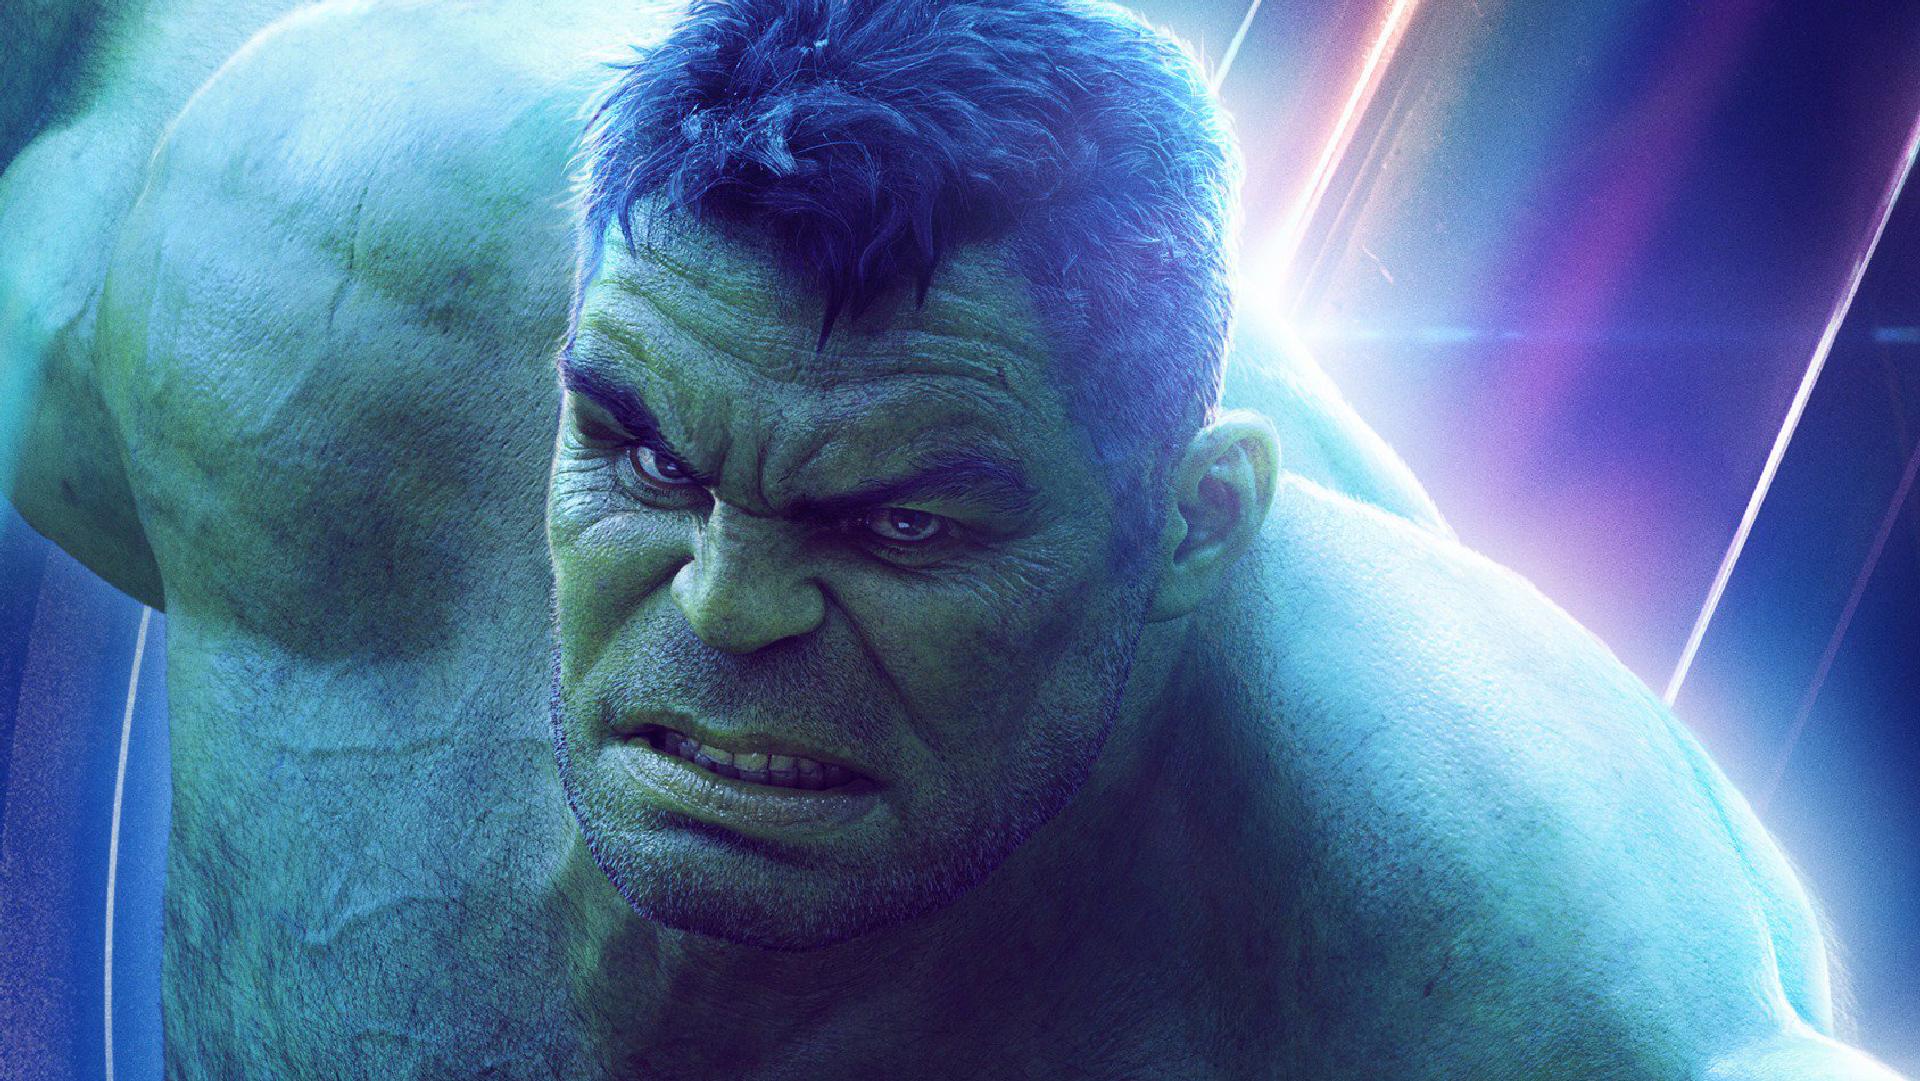 Shuri In Avengers Infinity War New Poster Hd Movies 4k: Hulk In Avengers Infinity War New Poster, HD Movies, 4k